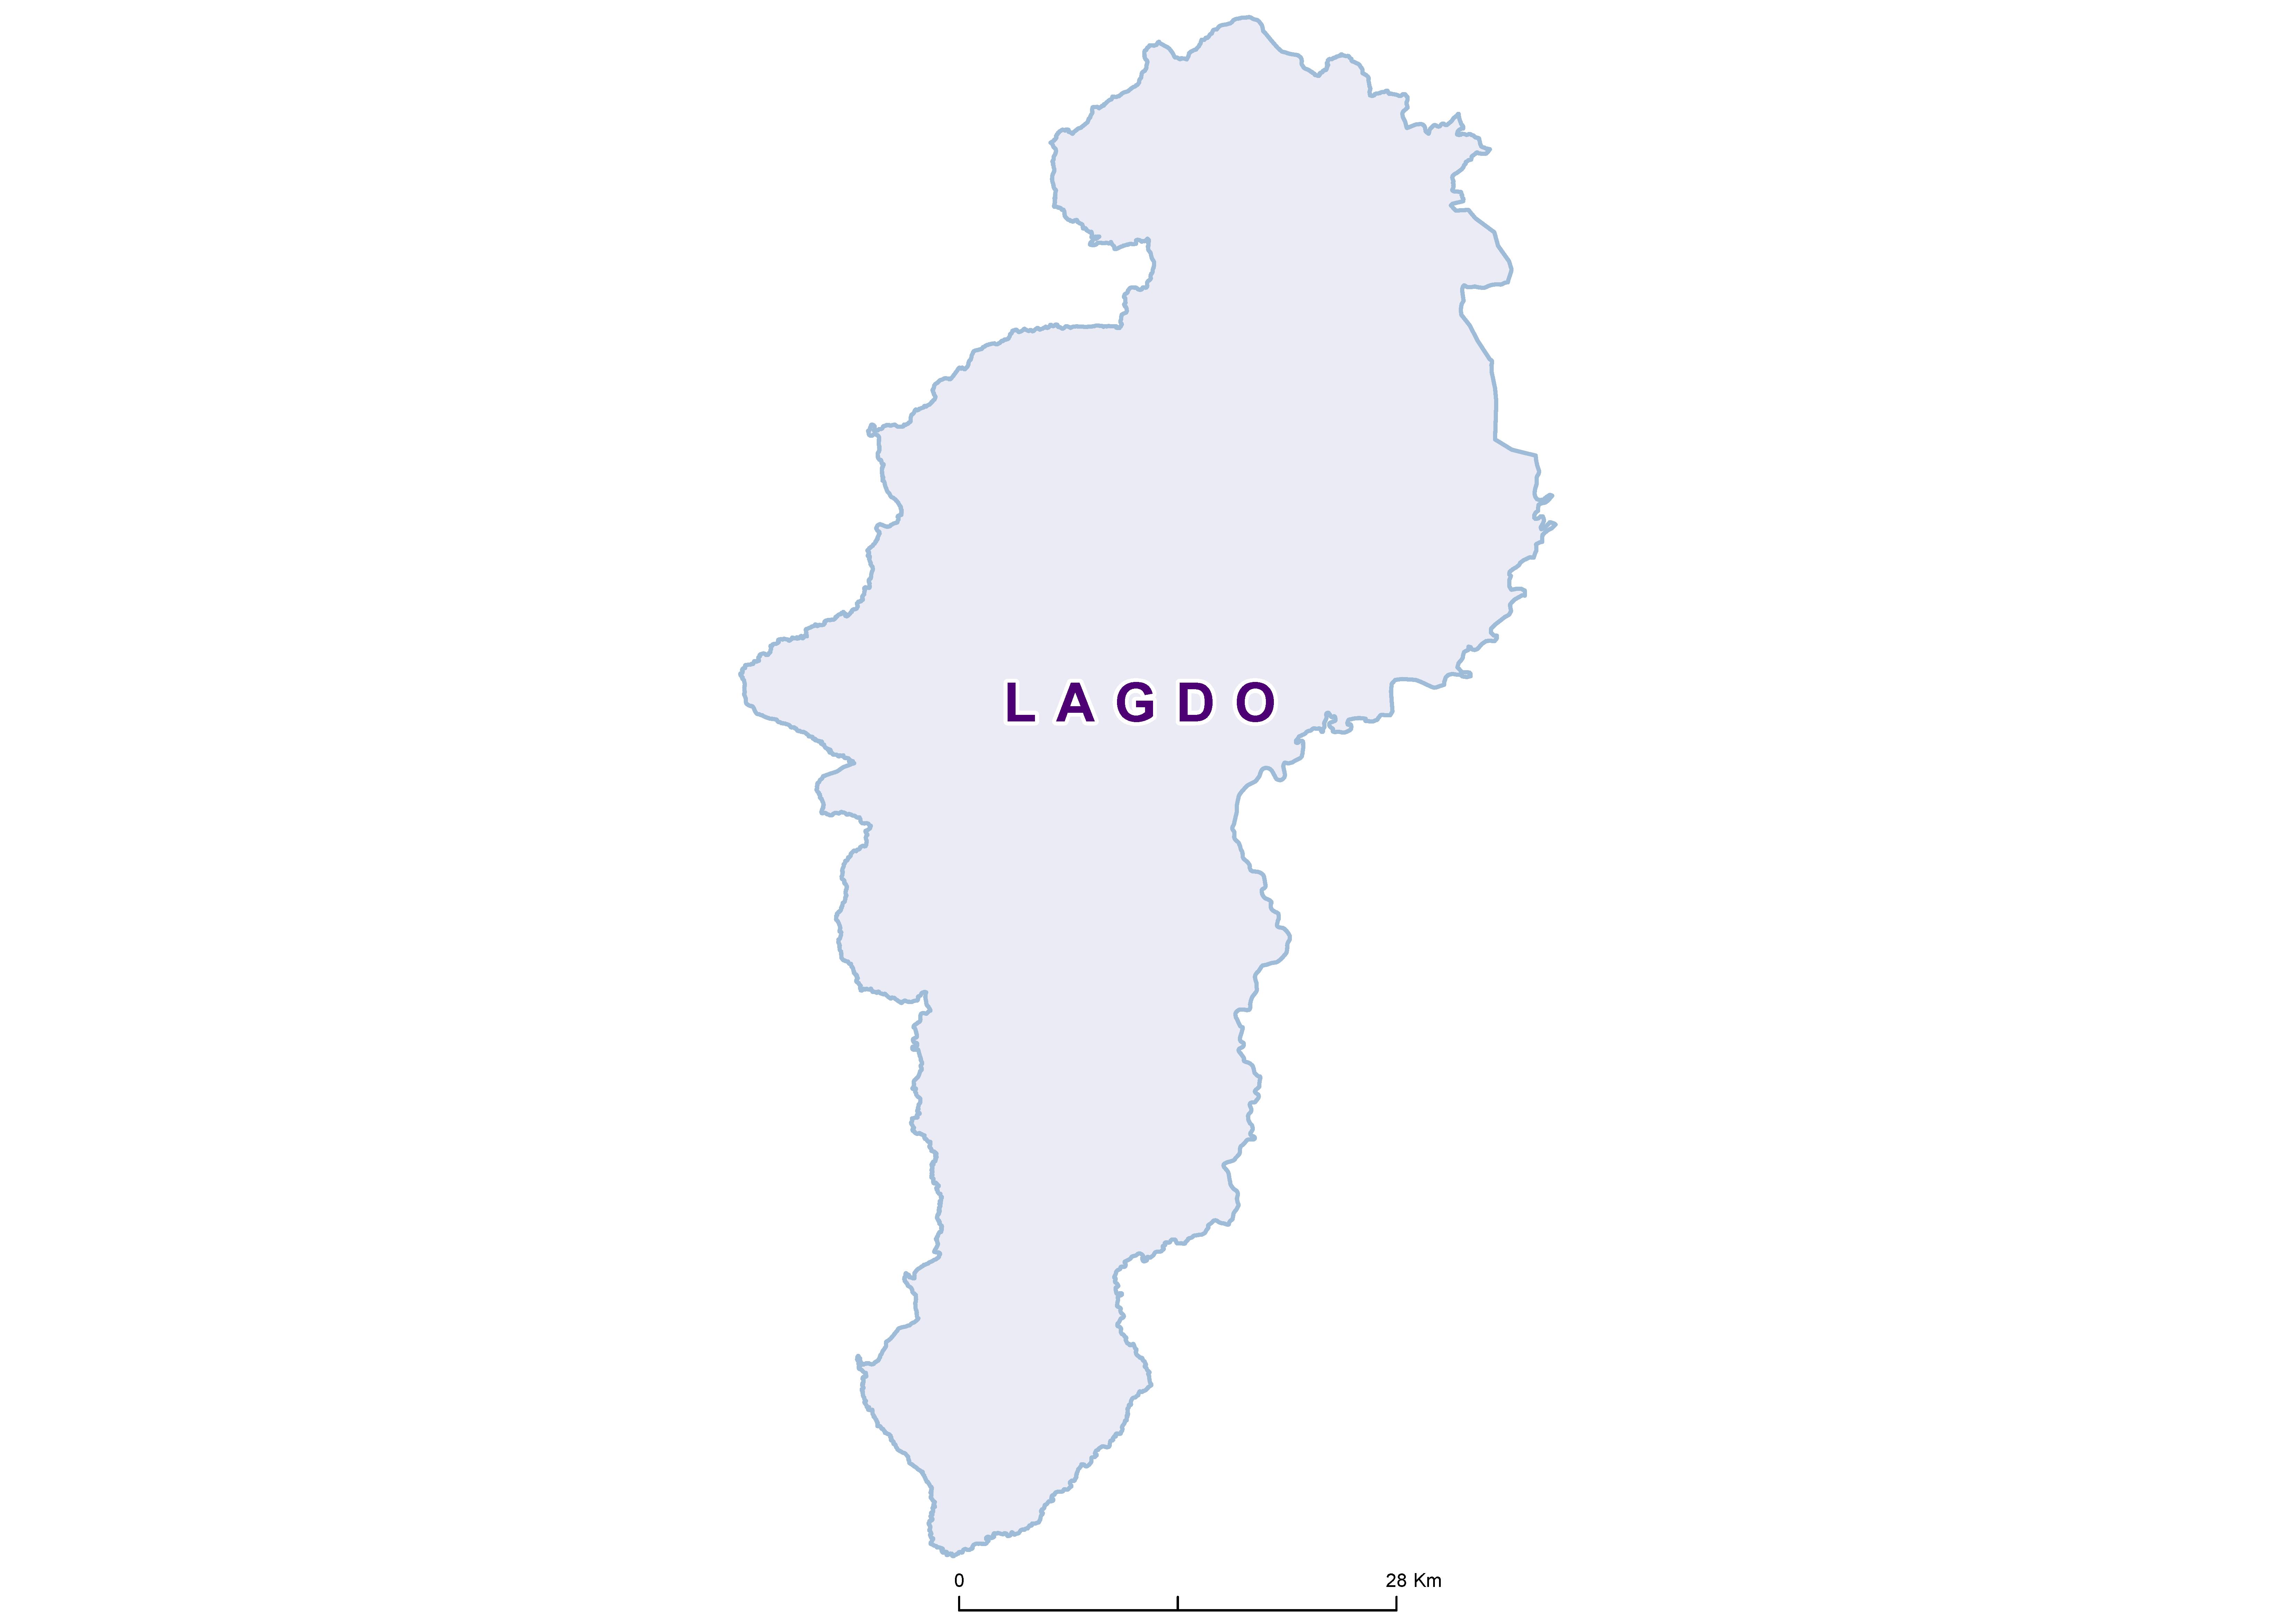 Lagdo Mean STH 19850001